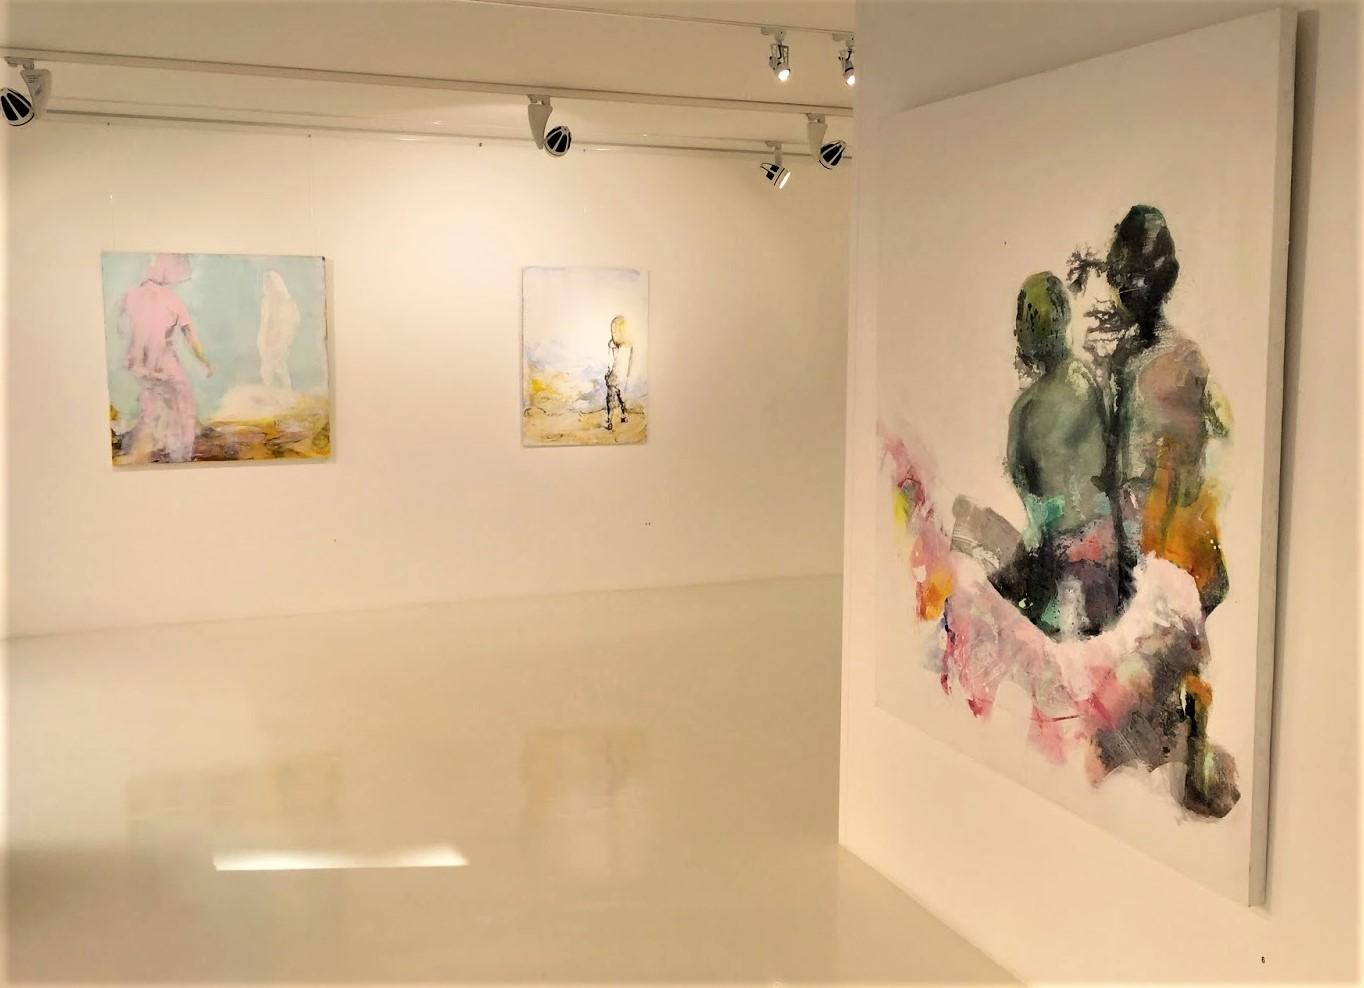 Gallery kajaste